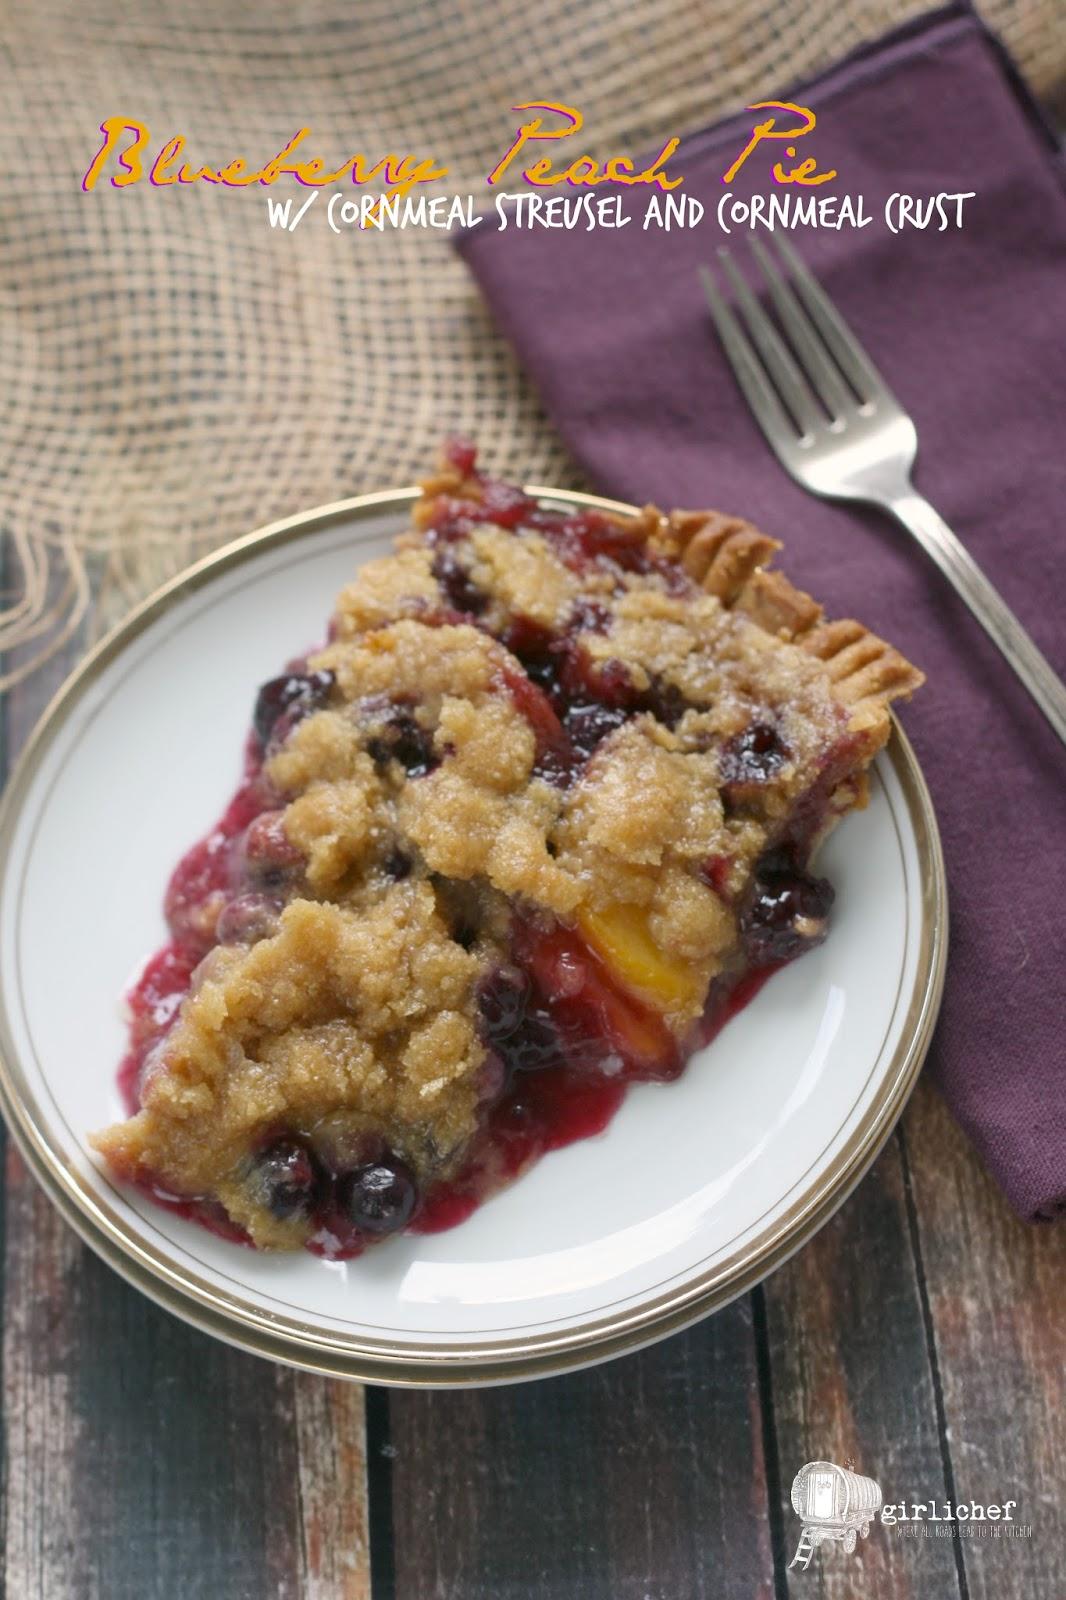 Blueberry Peach Pie W Cornmeal Streusel And Crust Fridaypieday